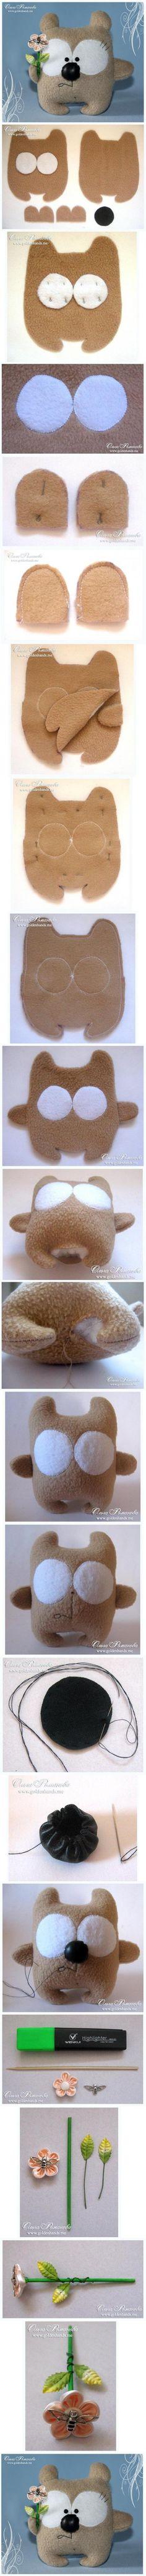 DIY Cute Little Fabric Bear